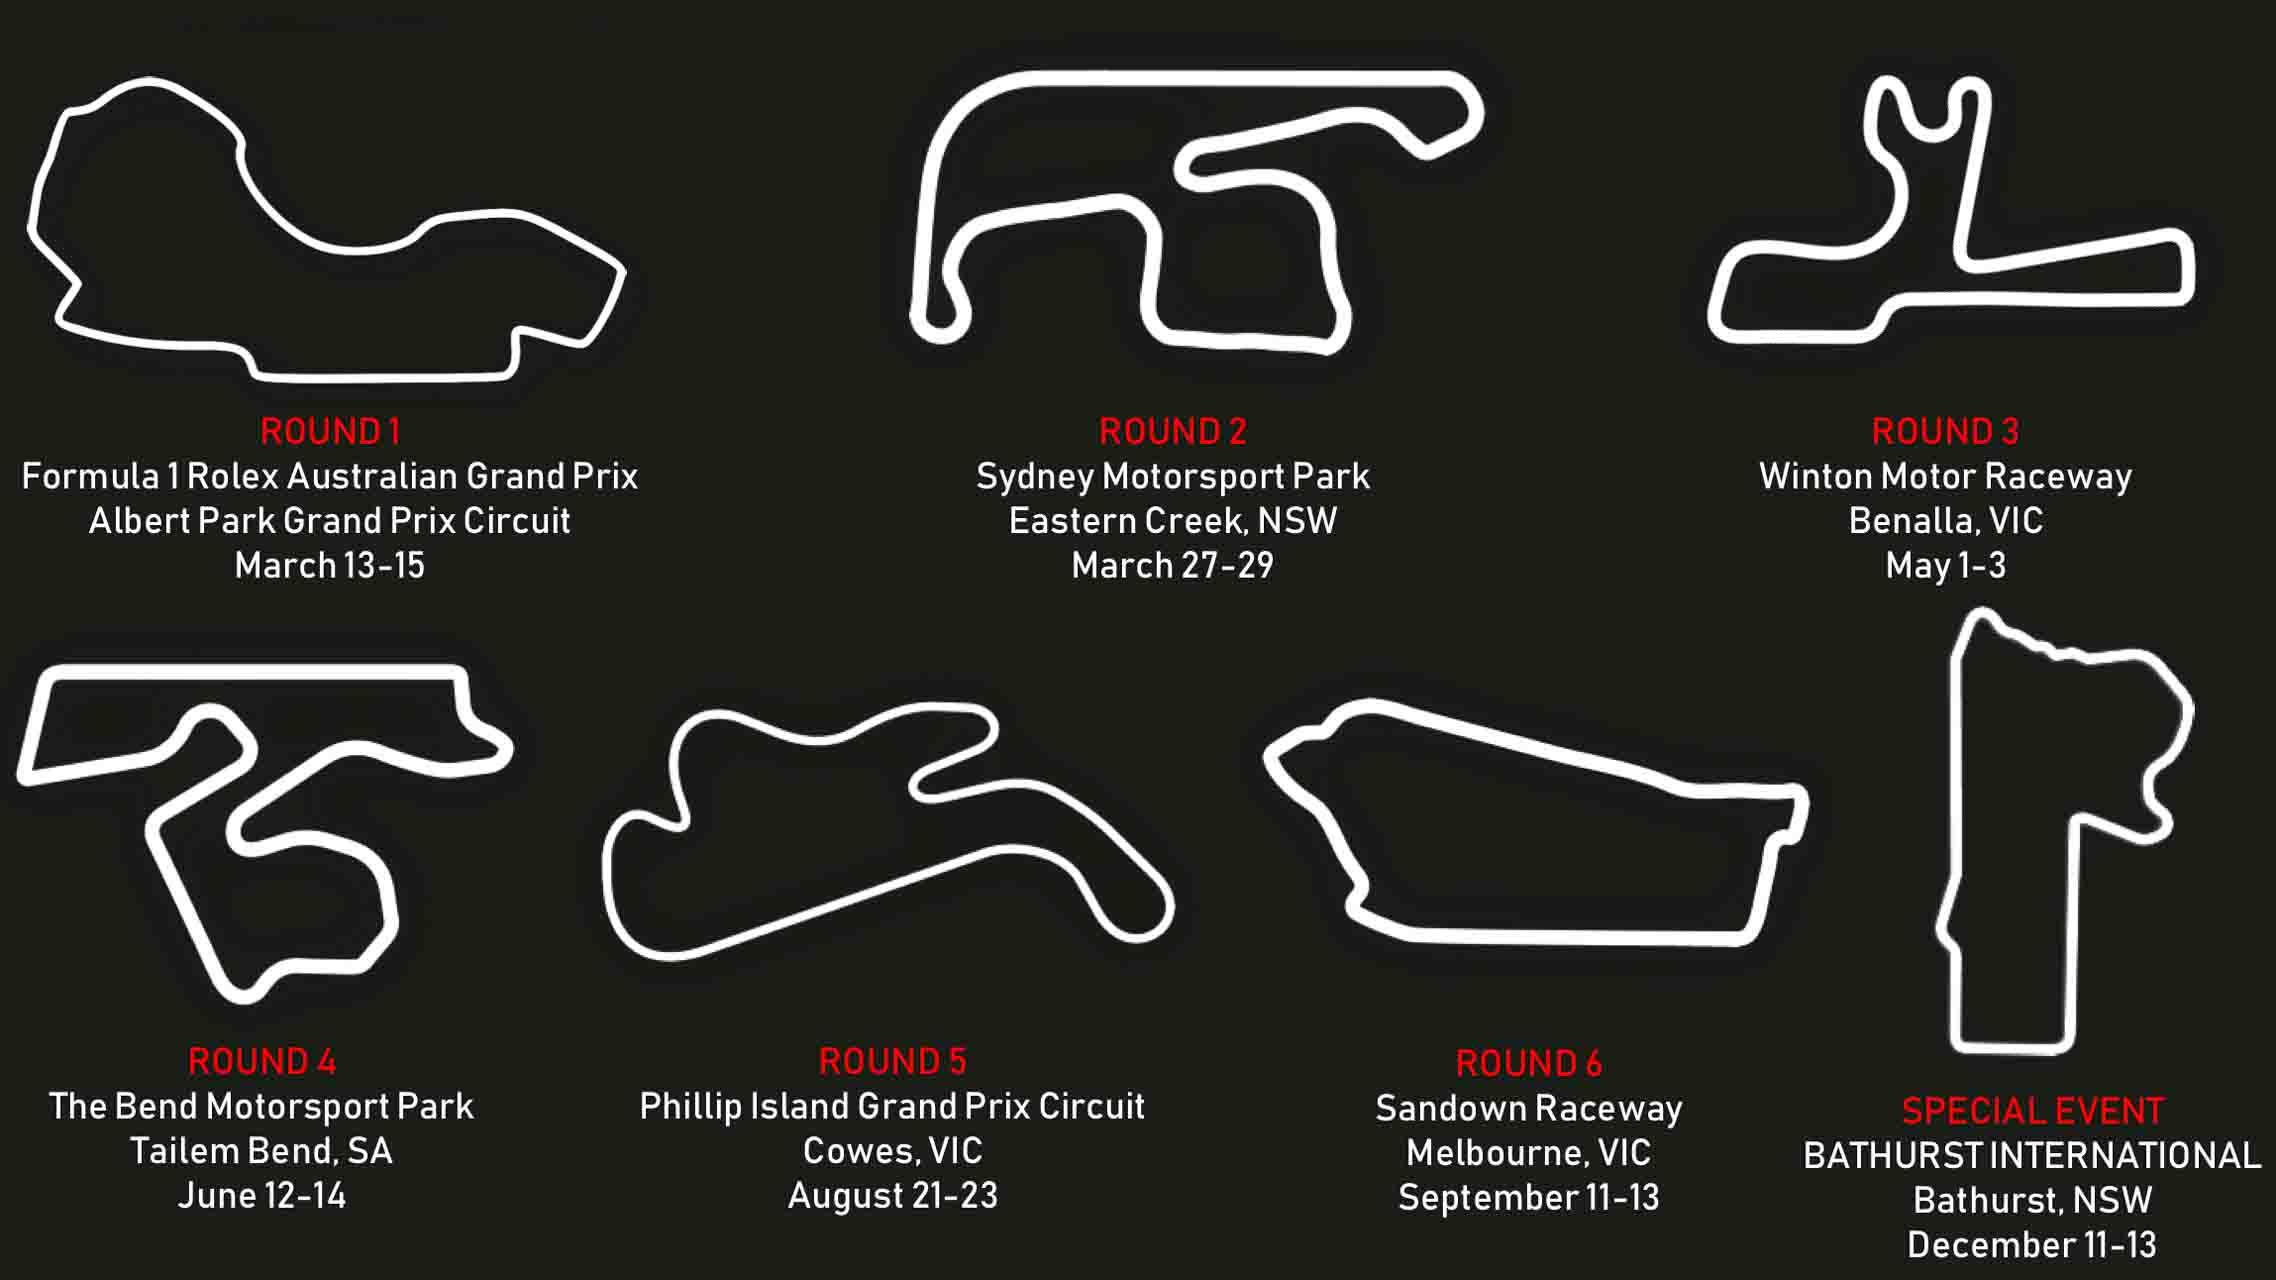 Barton Mawer Motorsport competing in the 2020 S5000 Series racing calendar